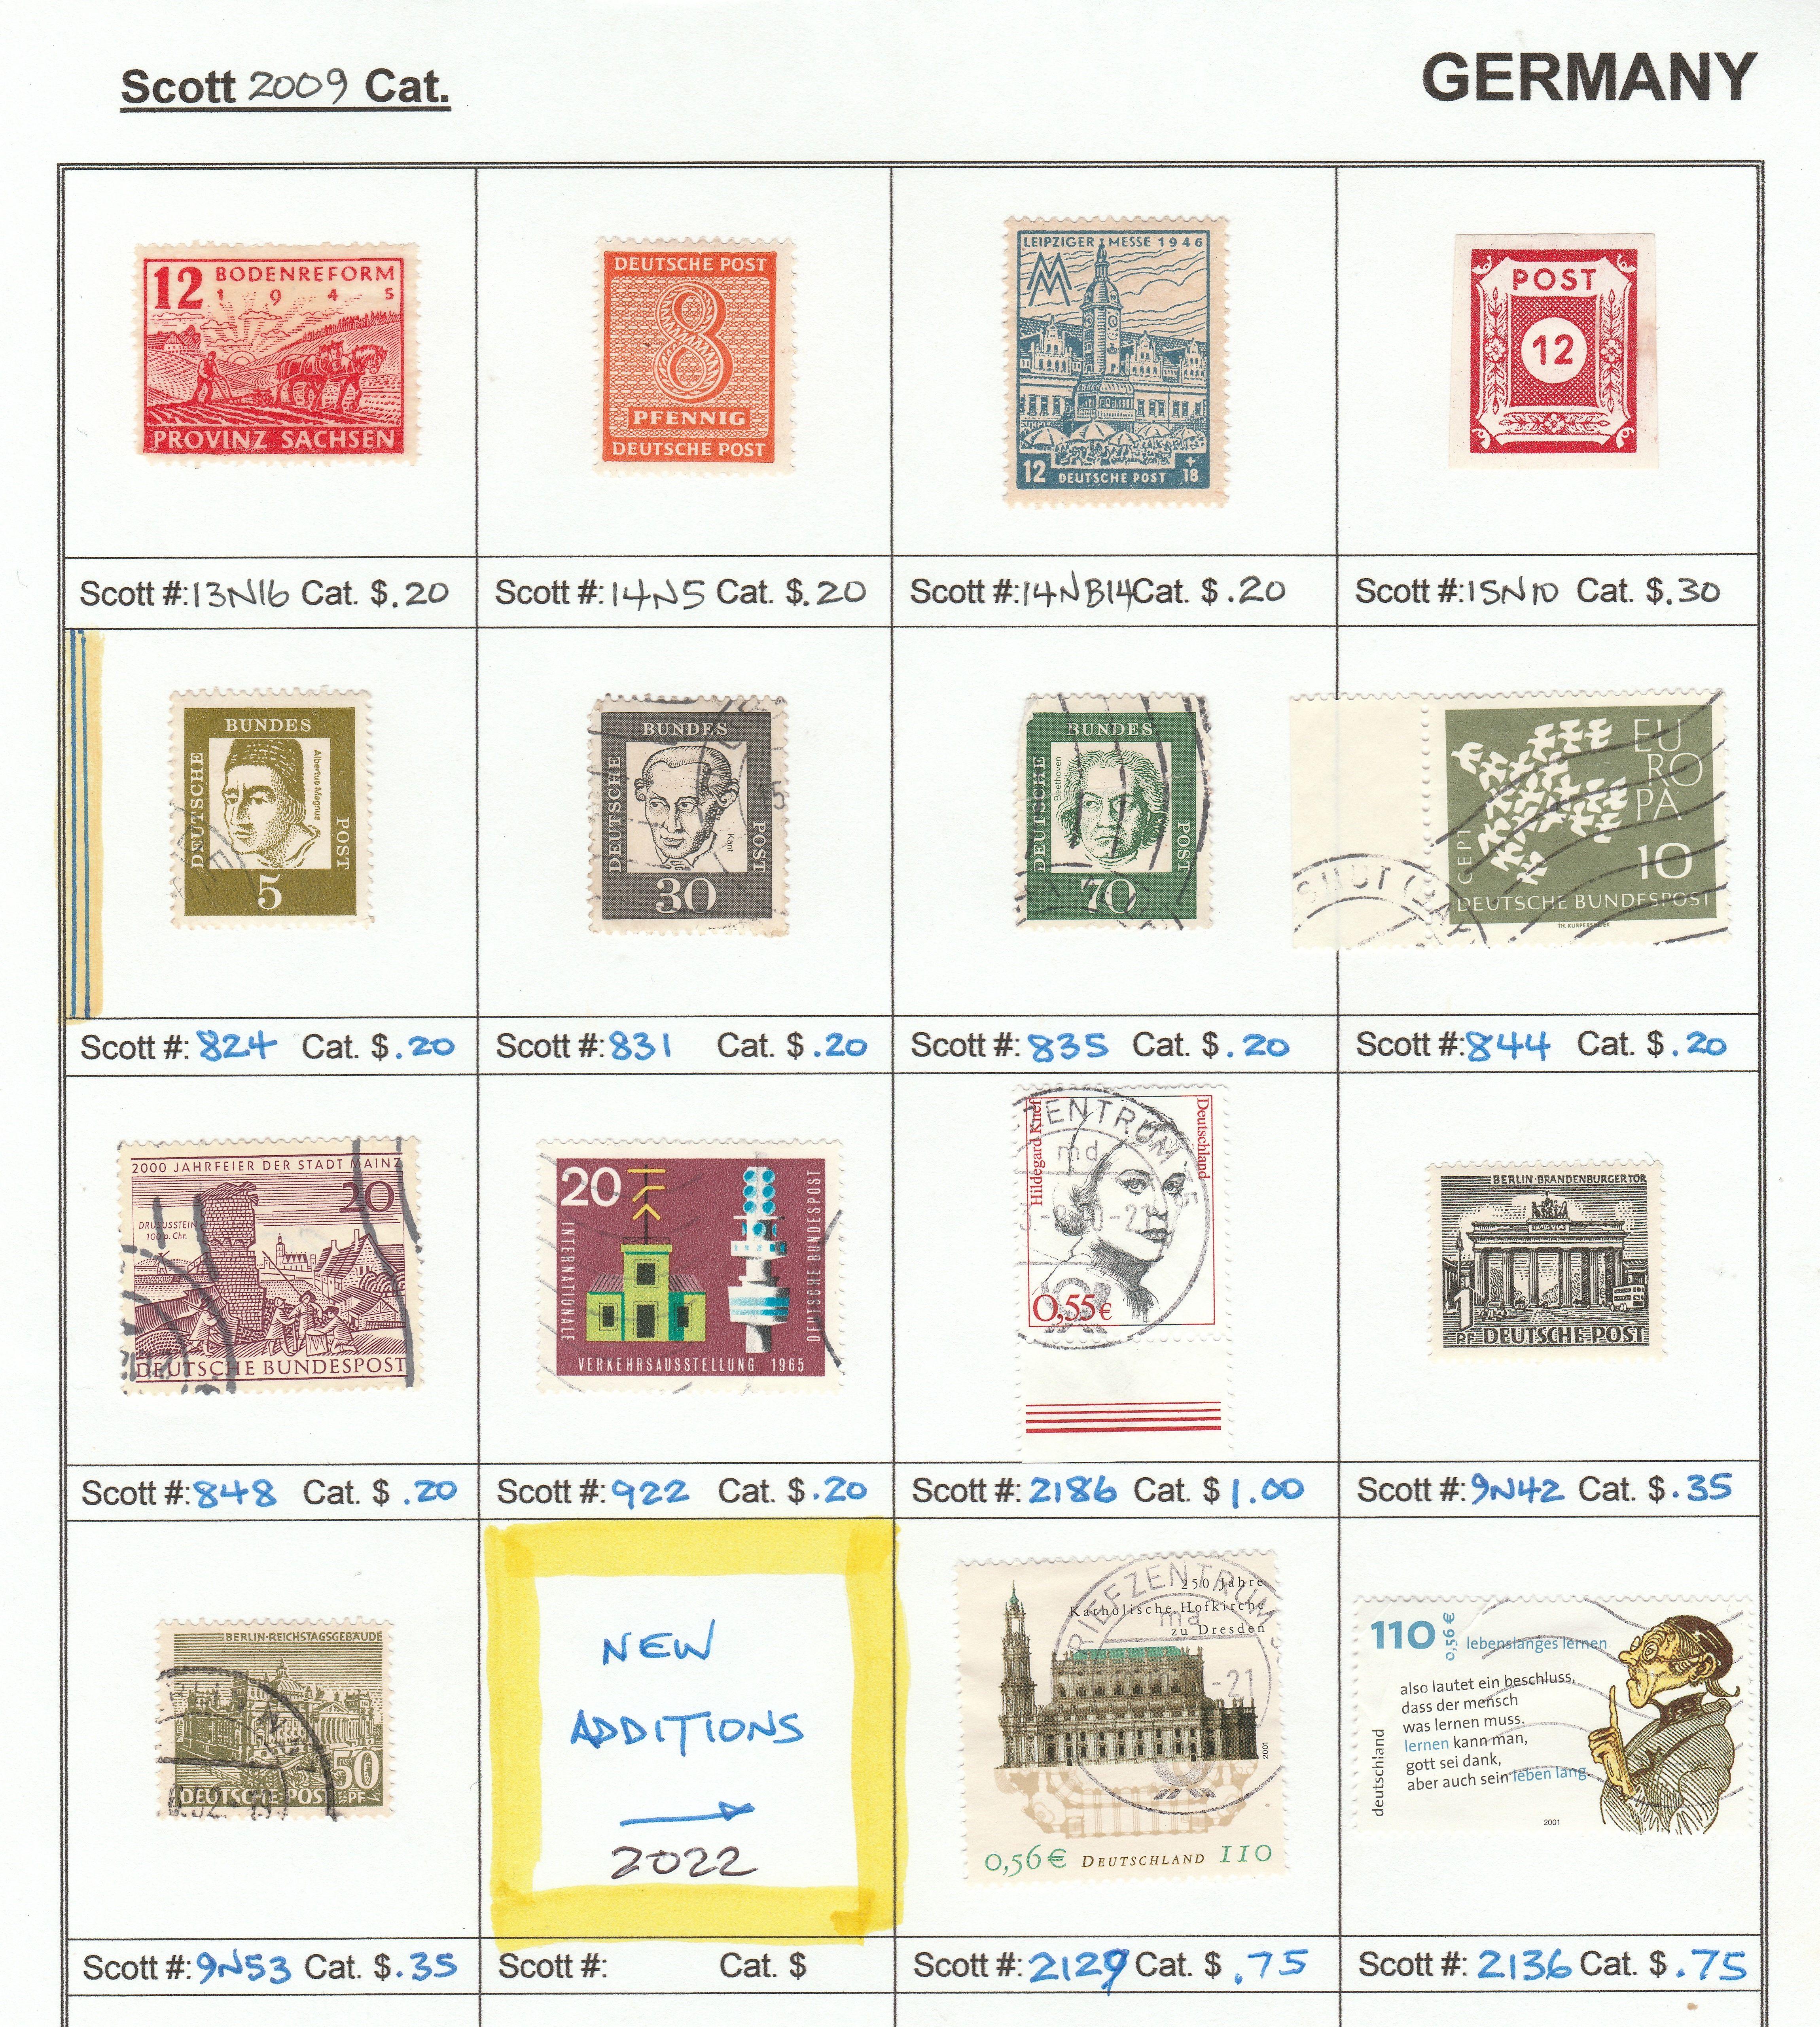 http://www.stamporator.com/images/Germany-044.jpg